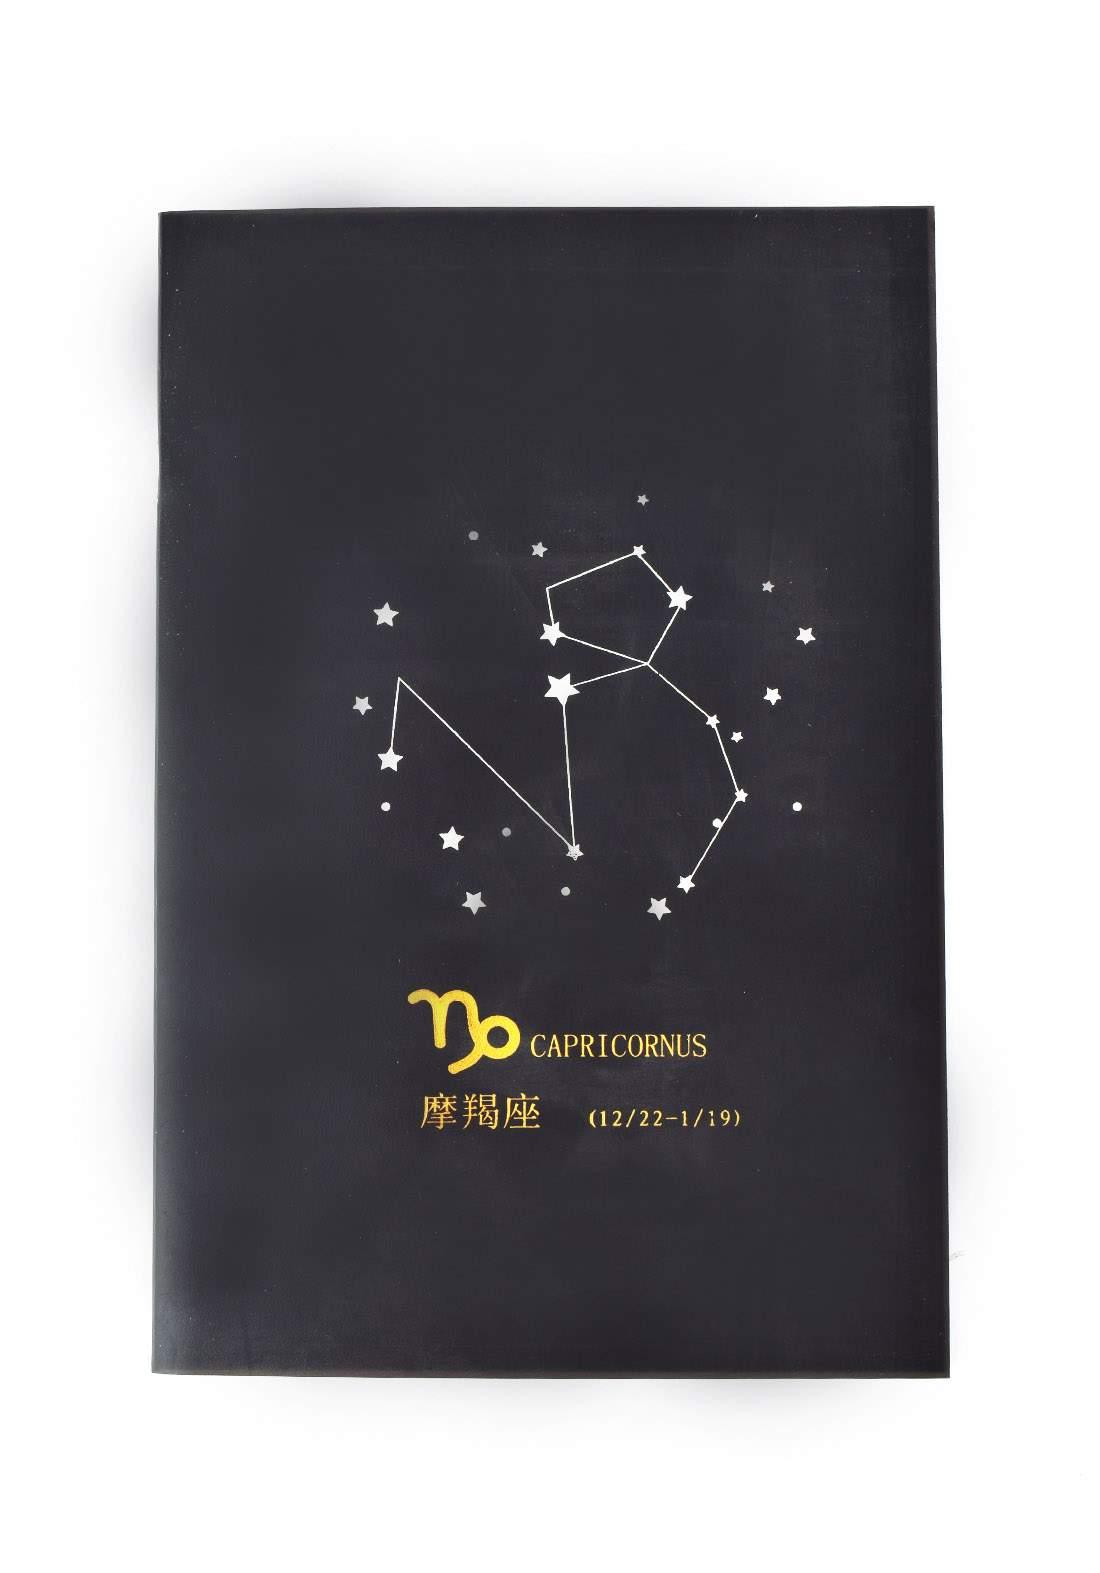 Small Black Drawing Book 24 Sheets-Capricornus دفتر رسم اسود صغير بطبعة برج الجدي